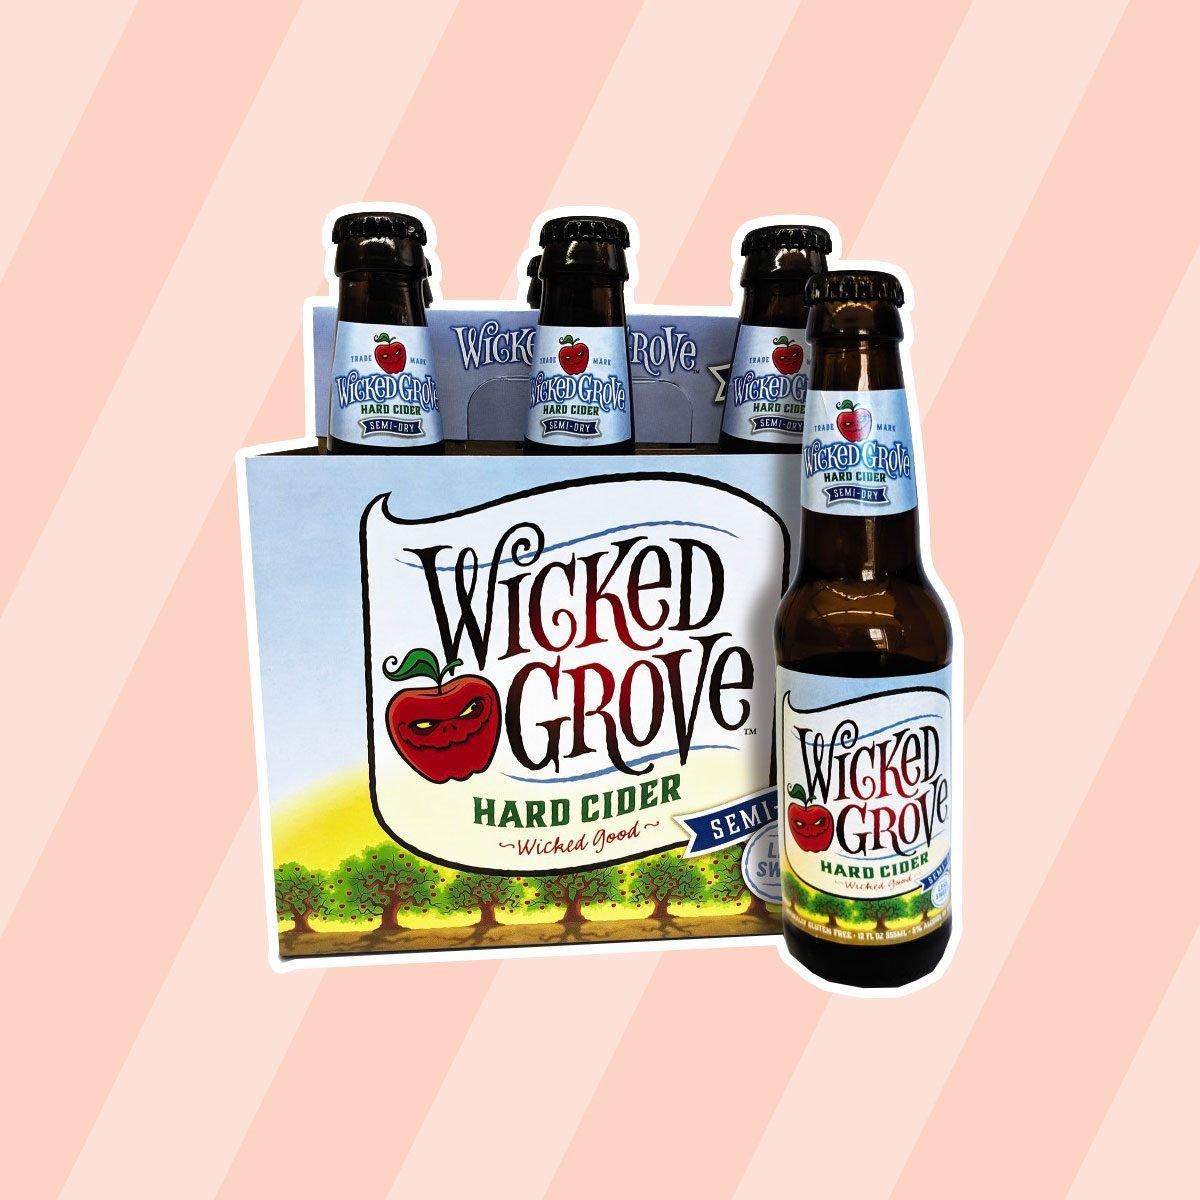 Wicked Grove Semi-Dry Hard Cider